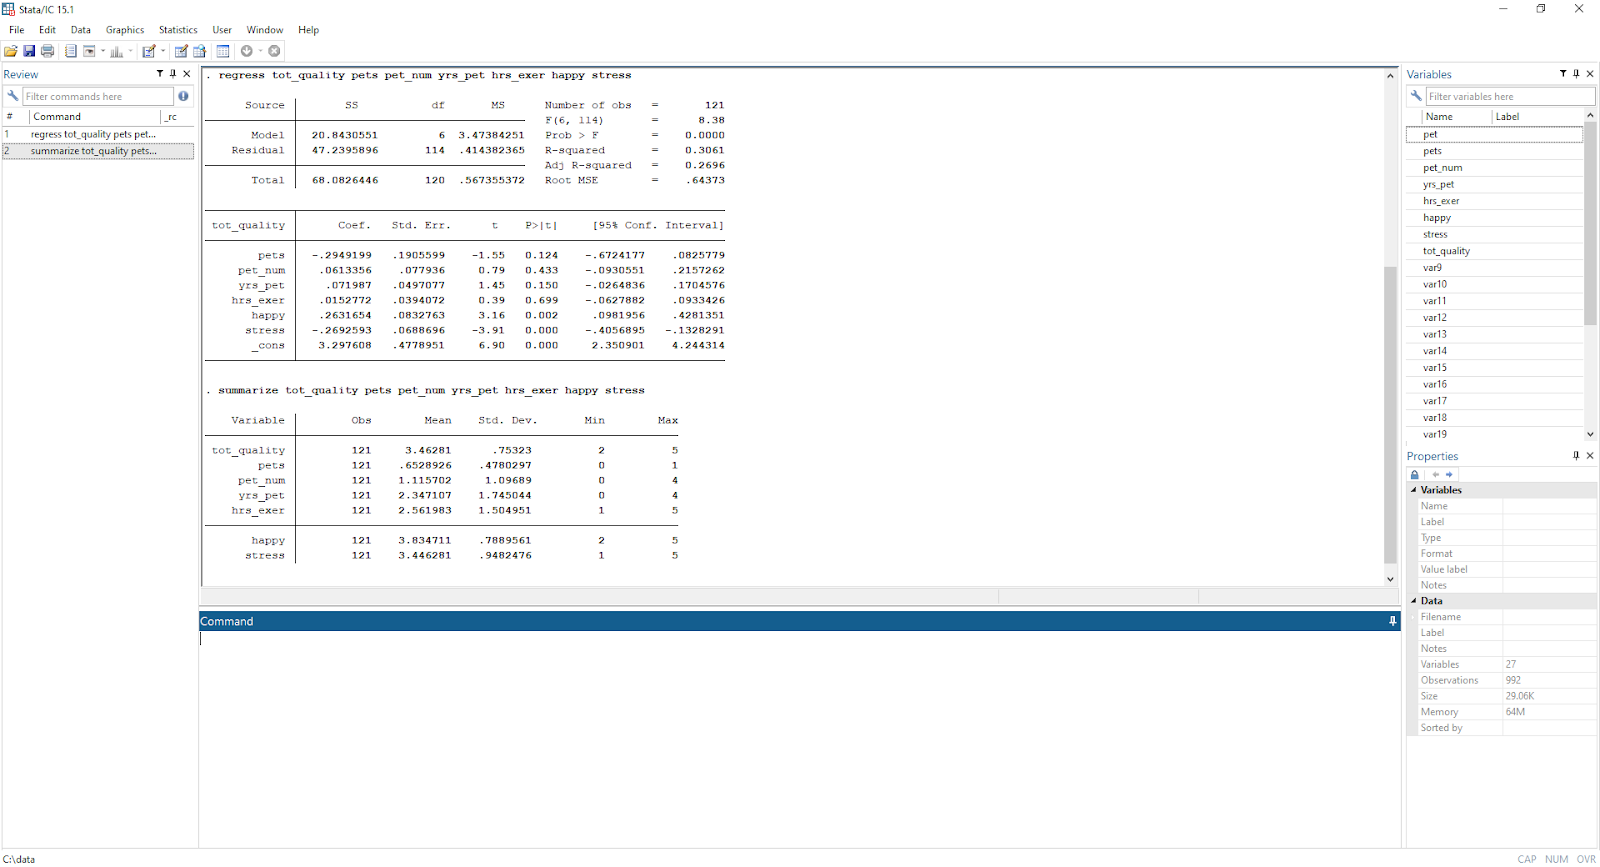 A Stata/IC 15.1 Graphics File Edit Data Statistics User Window Help Variables Review regress tot_quality pets pet_num yrs_pet